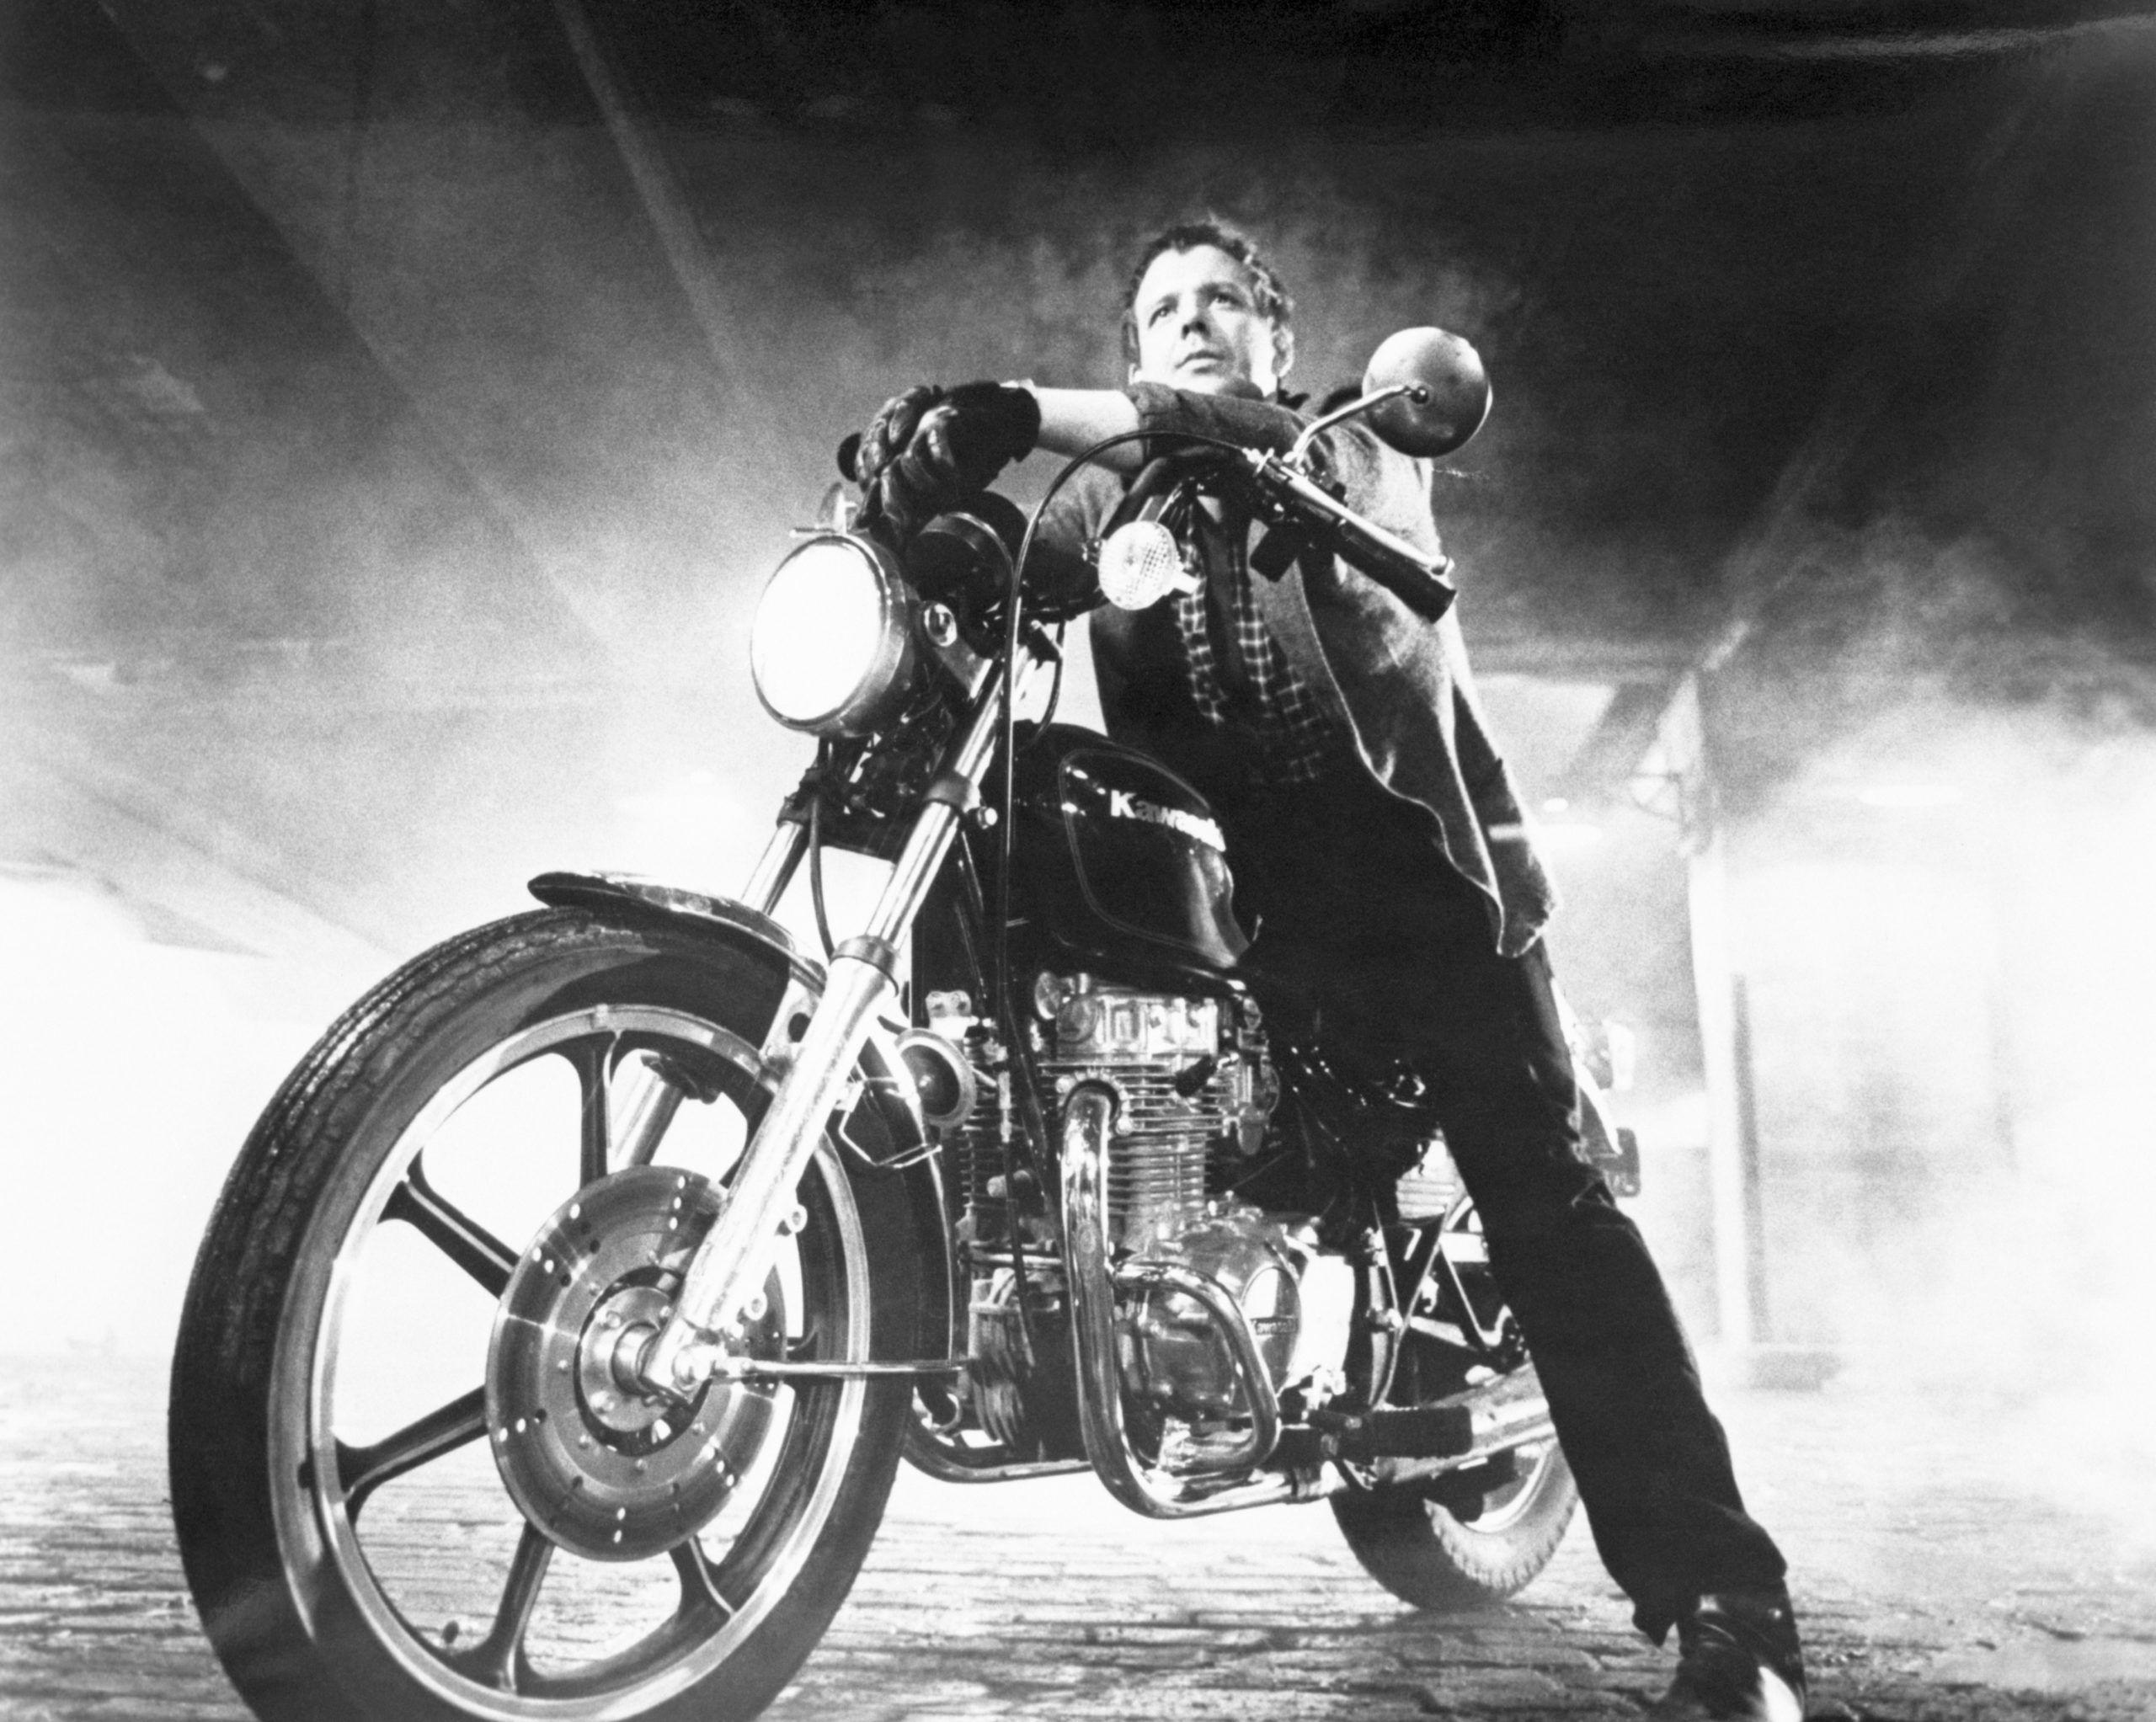 Mickey Rourke a Rablóhal című filmben a Motoros srácként (Photo by Sunset Boulevard/Corbis via Getty Images)